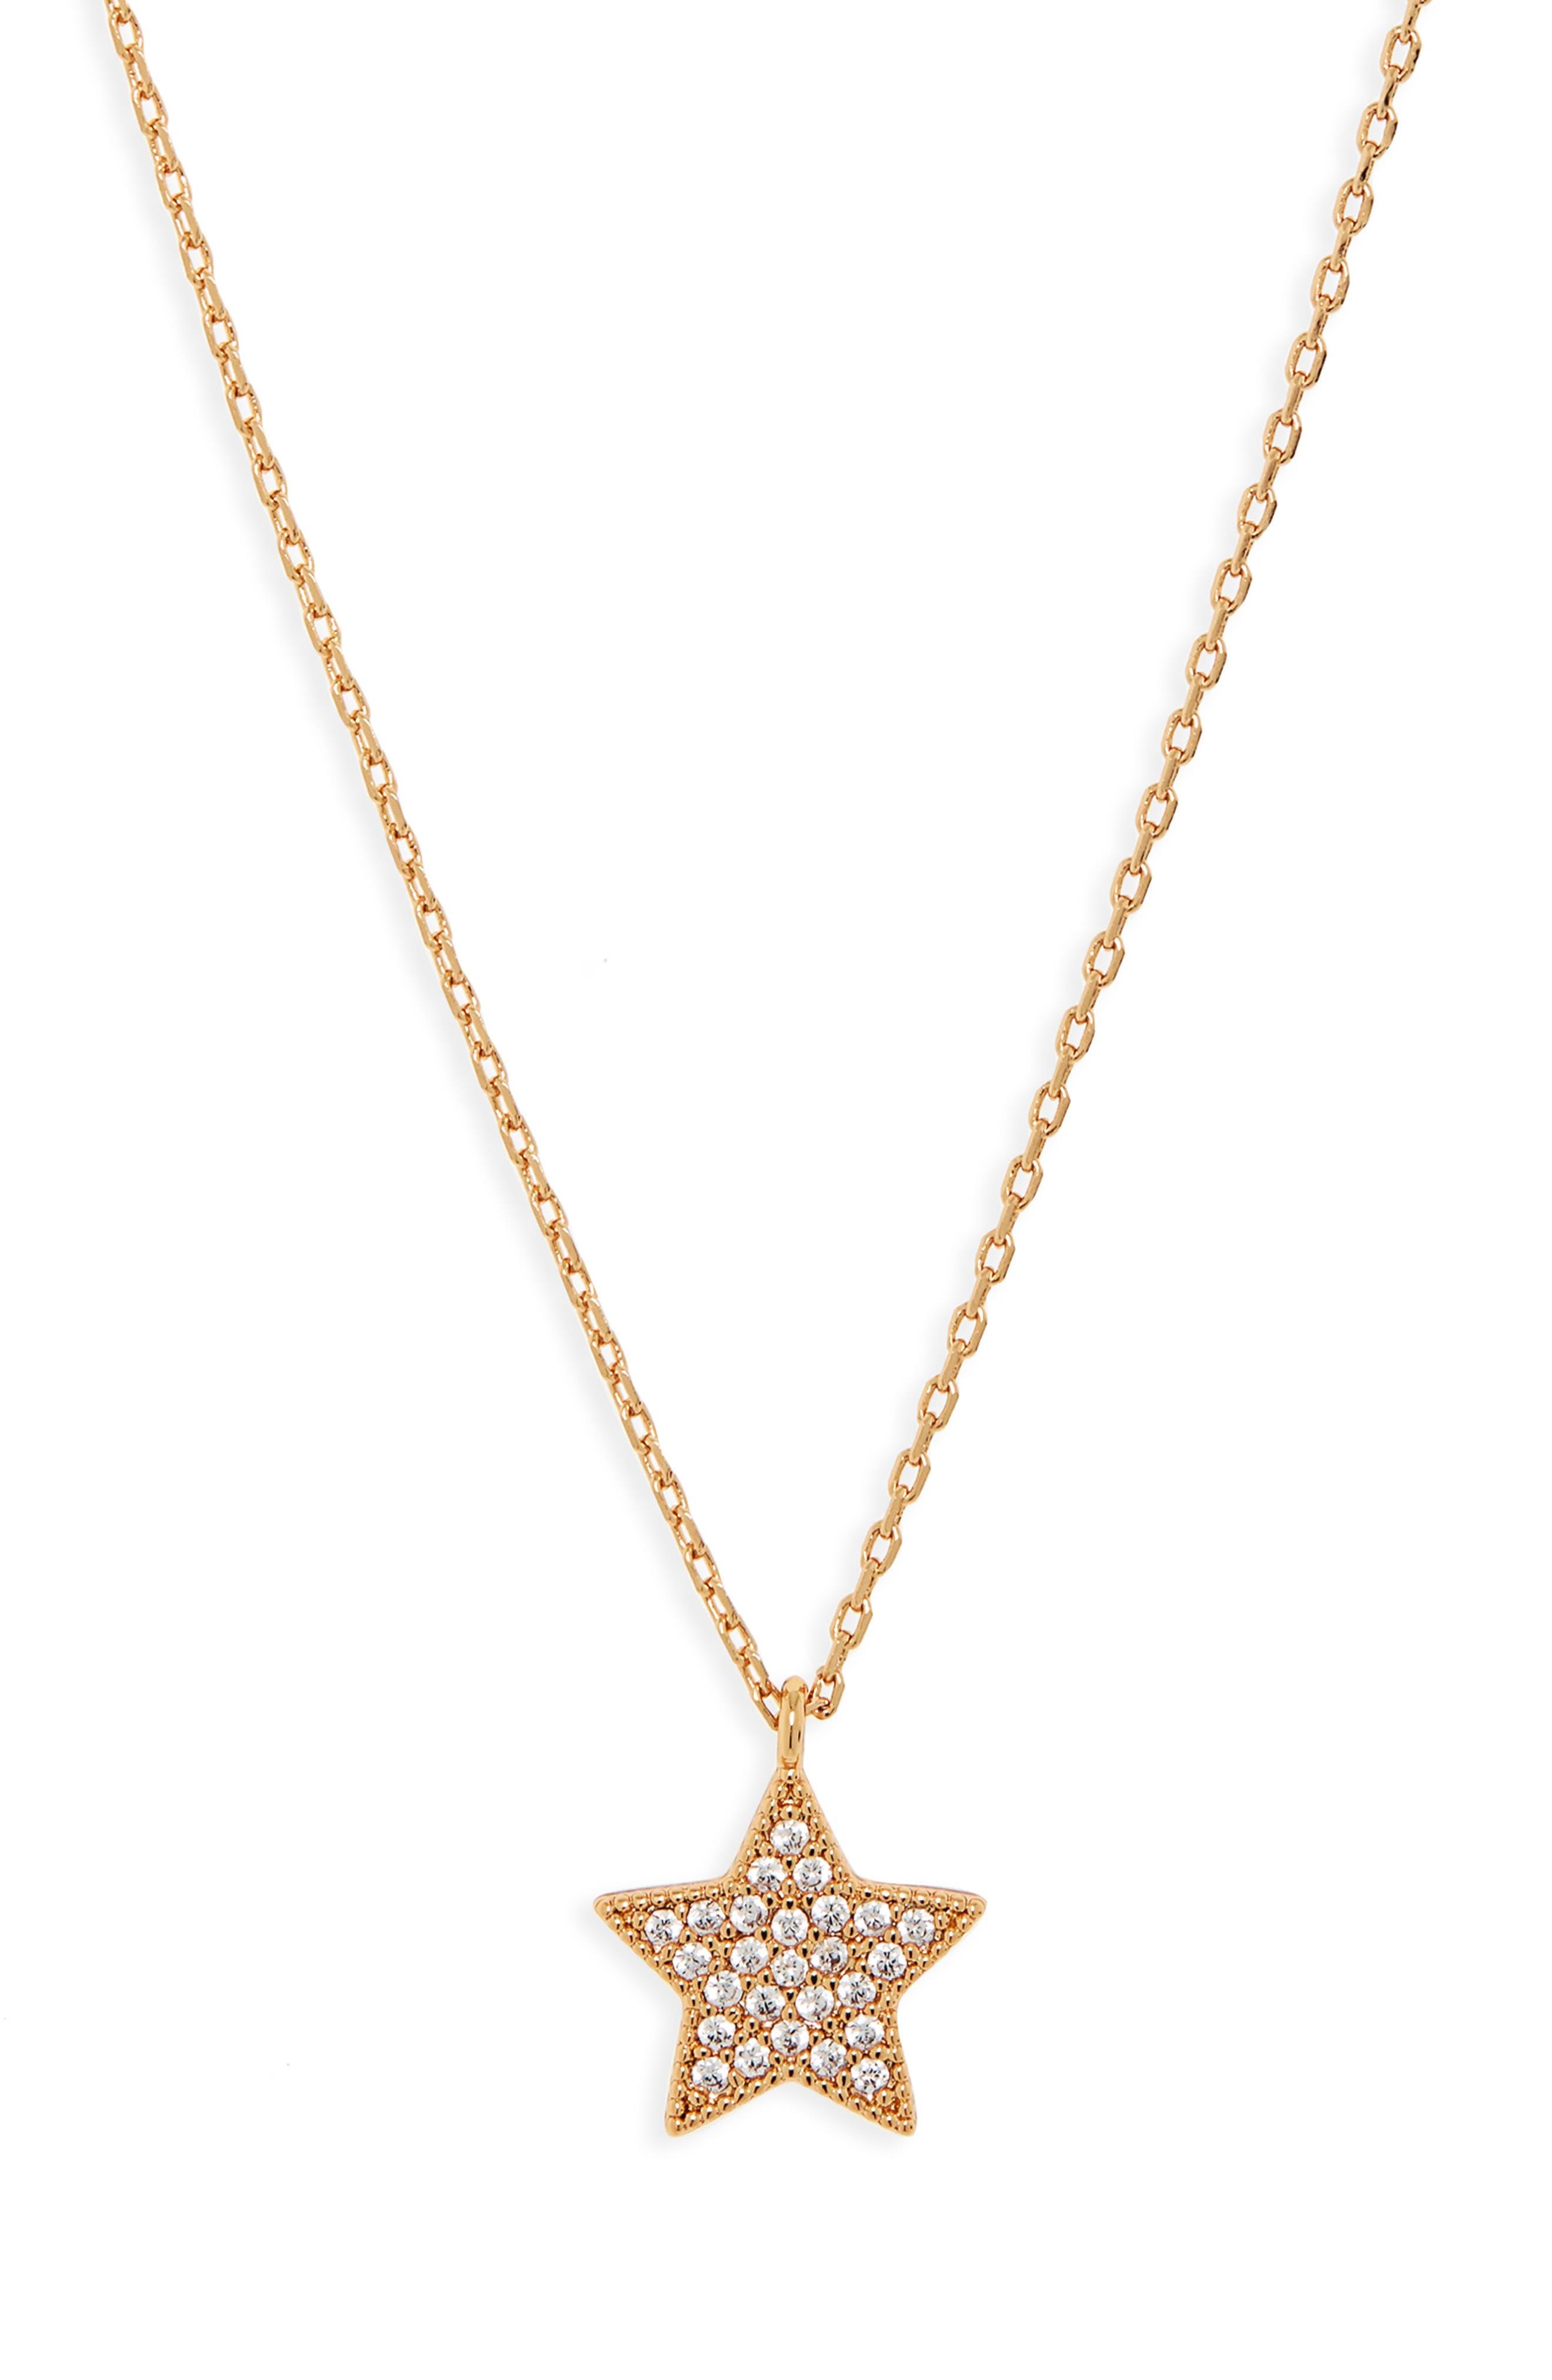 UNCOMMON JAMES BY KRISTIN CAVALLARI Big Star Pendant Necklace, Main, color, GOLD